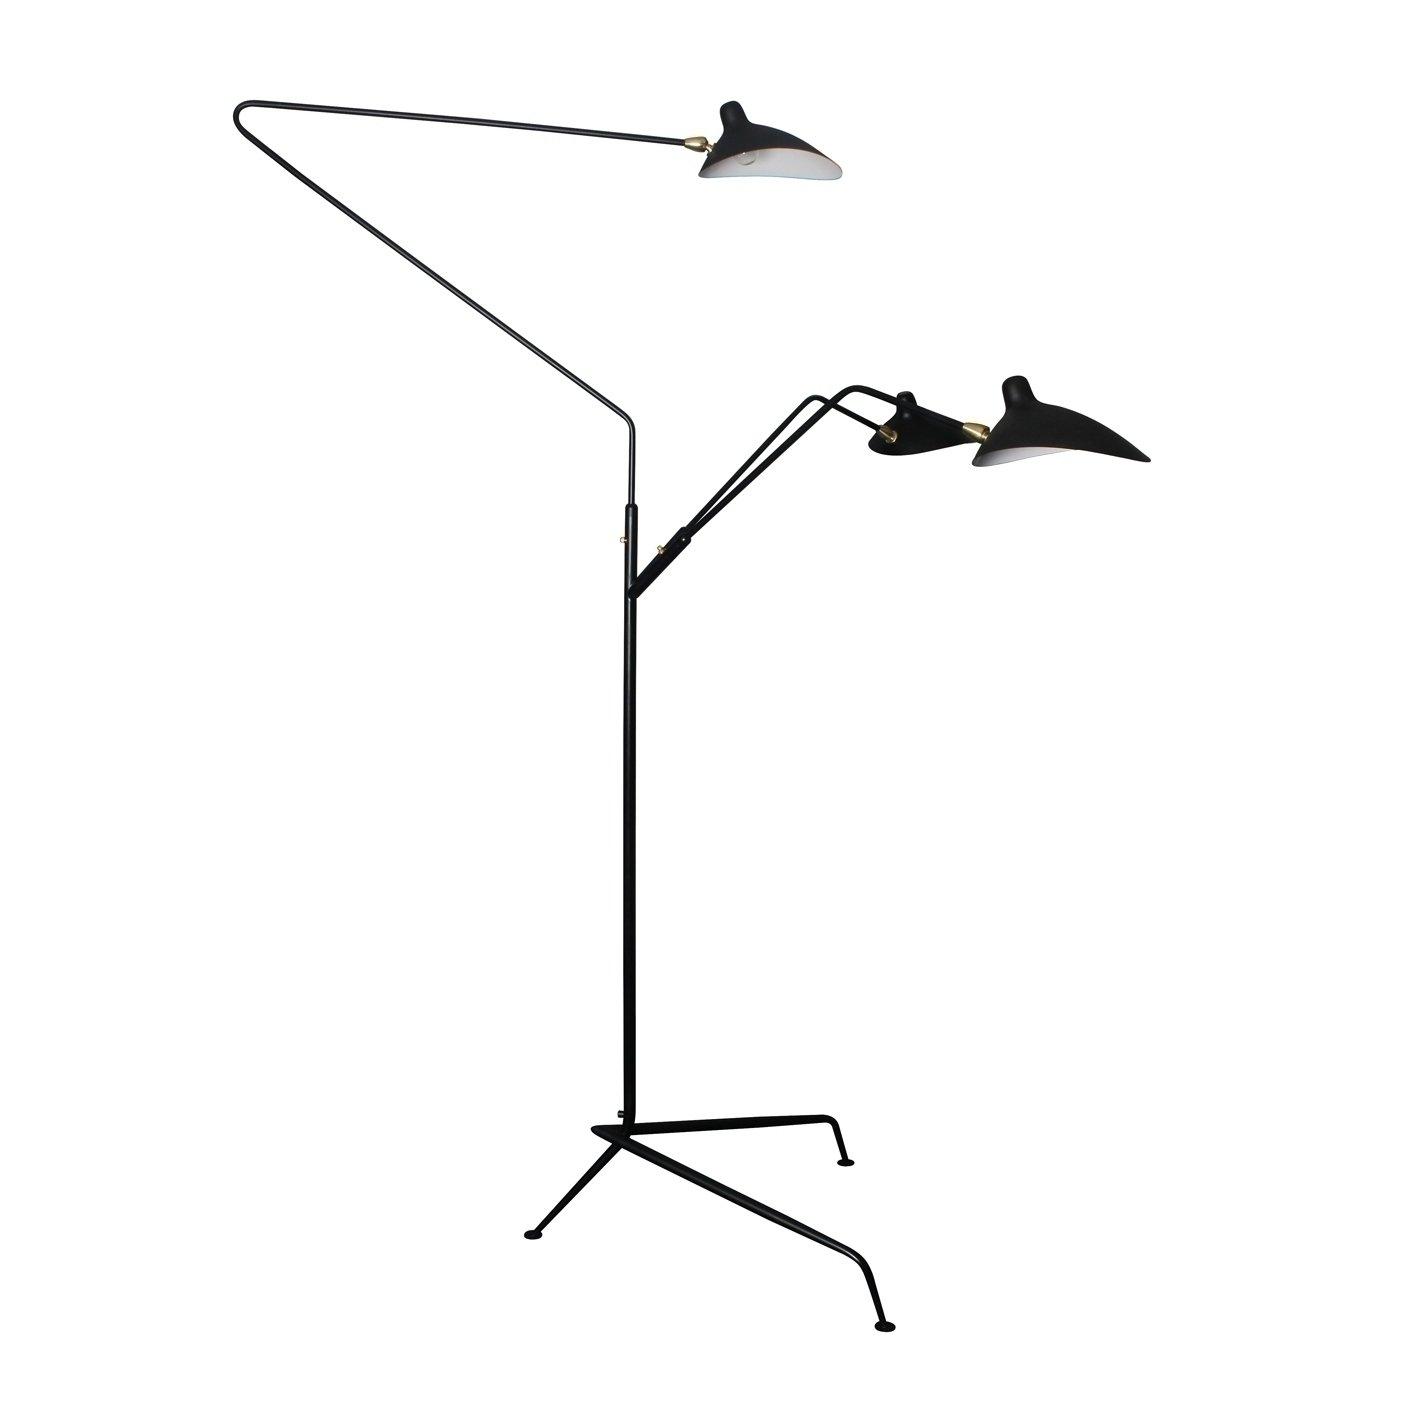 Minoa Standing Lamp 3 Arms Furniture-Lighting